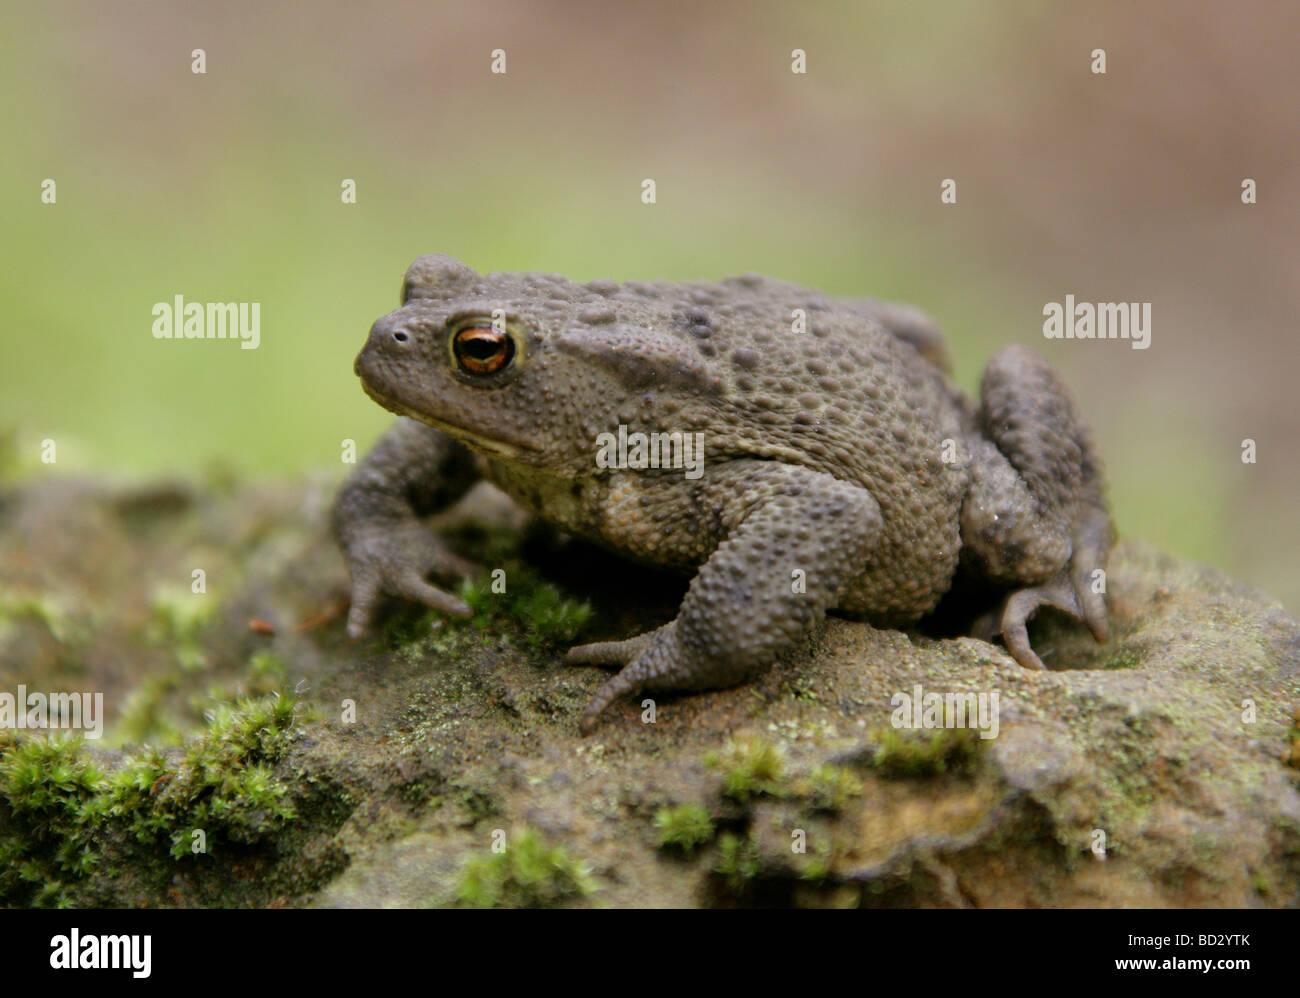 European or Common Toad, Bufo bufo, Bufonidae - Stock Image